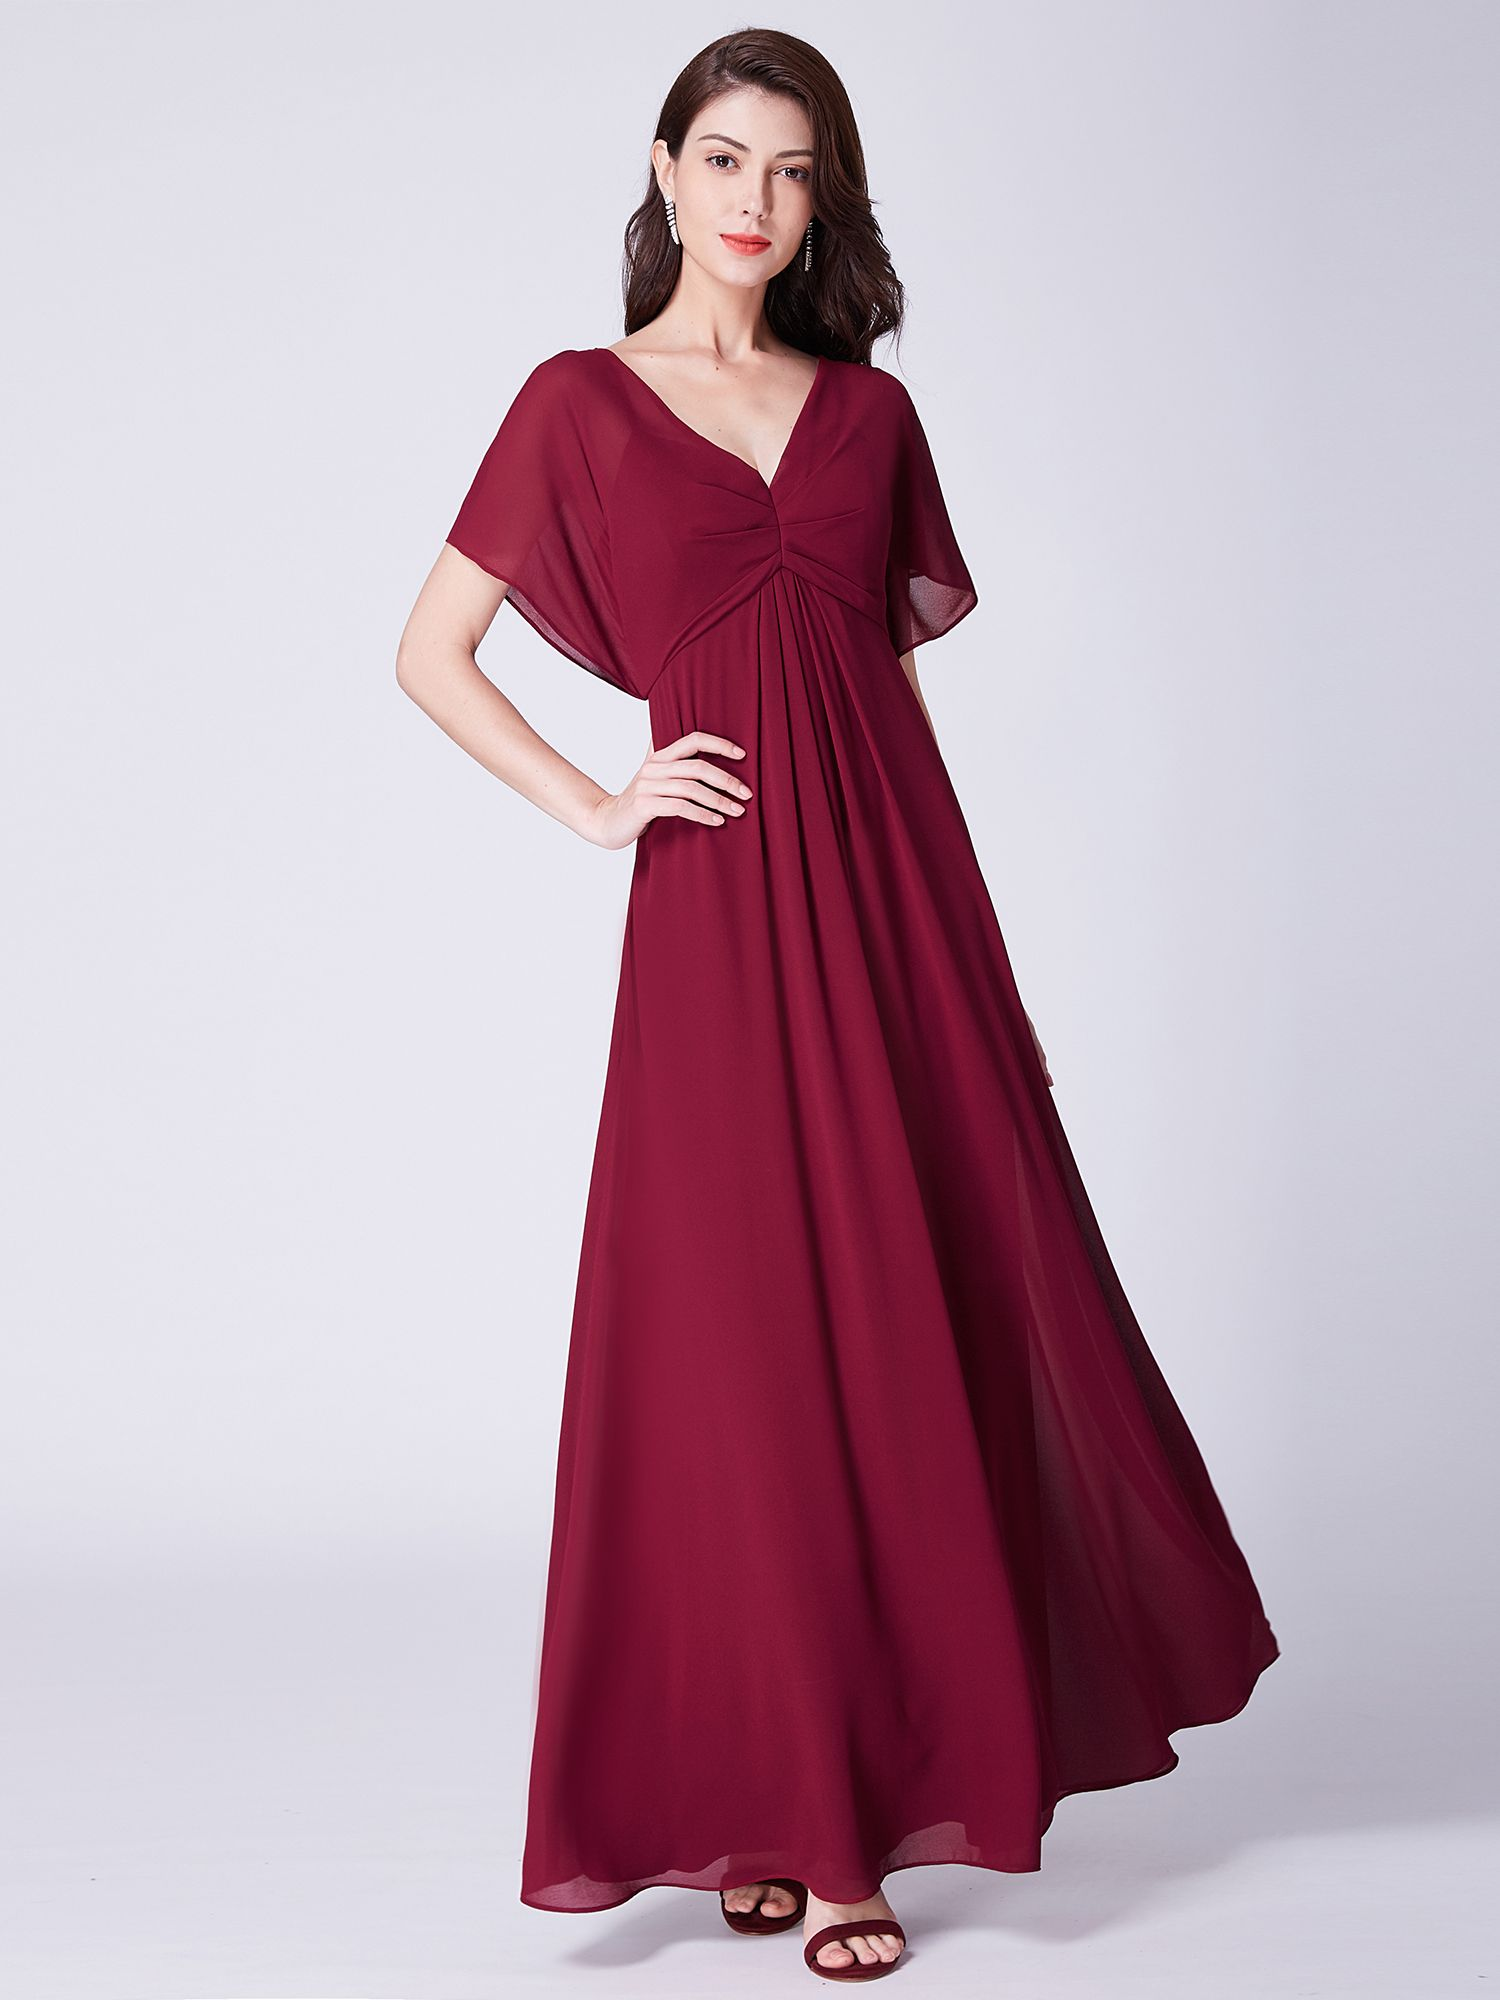 c21e6b6dafd46 Ever-Pretty Womens Vintage Floor-Length Short Sleeve Formal Evening Wedding  Mother of the Bride Dresses for Women 07421 Navy Blue US 4#Short, #Length,  ...